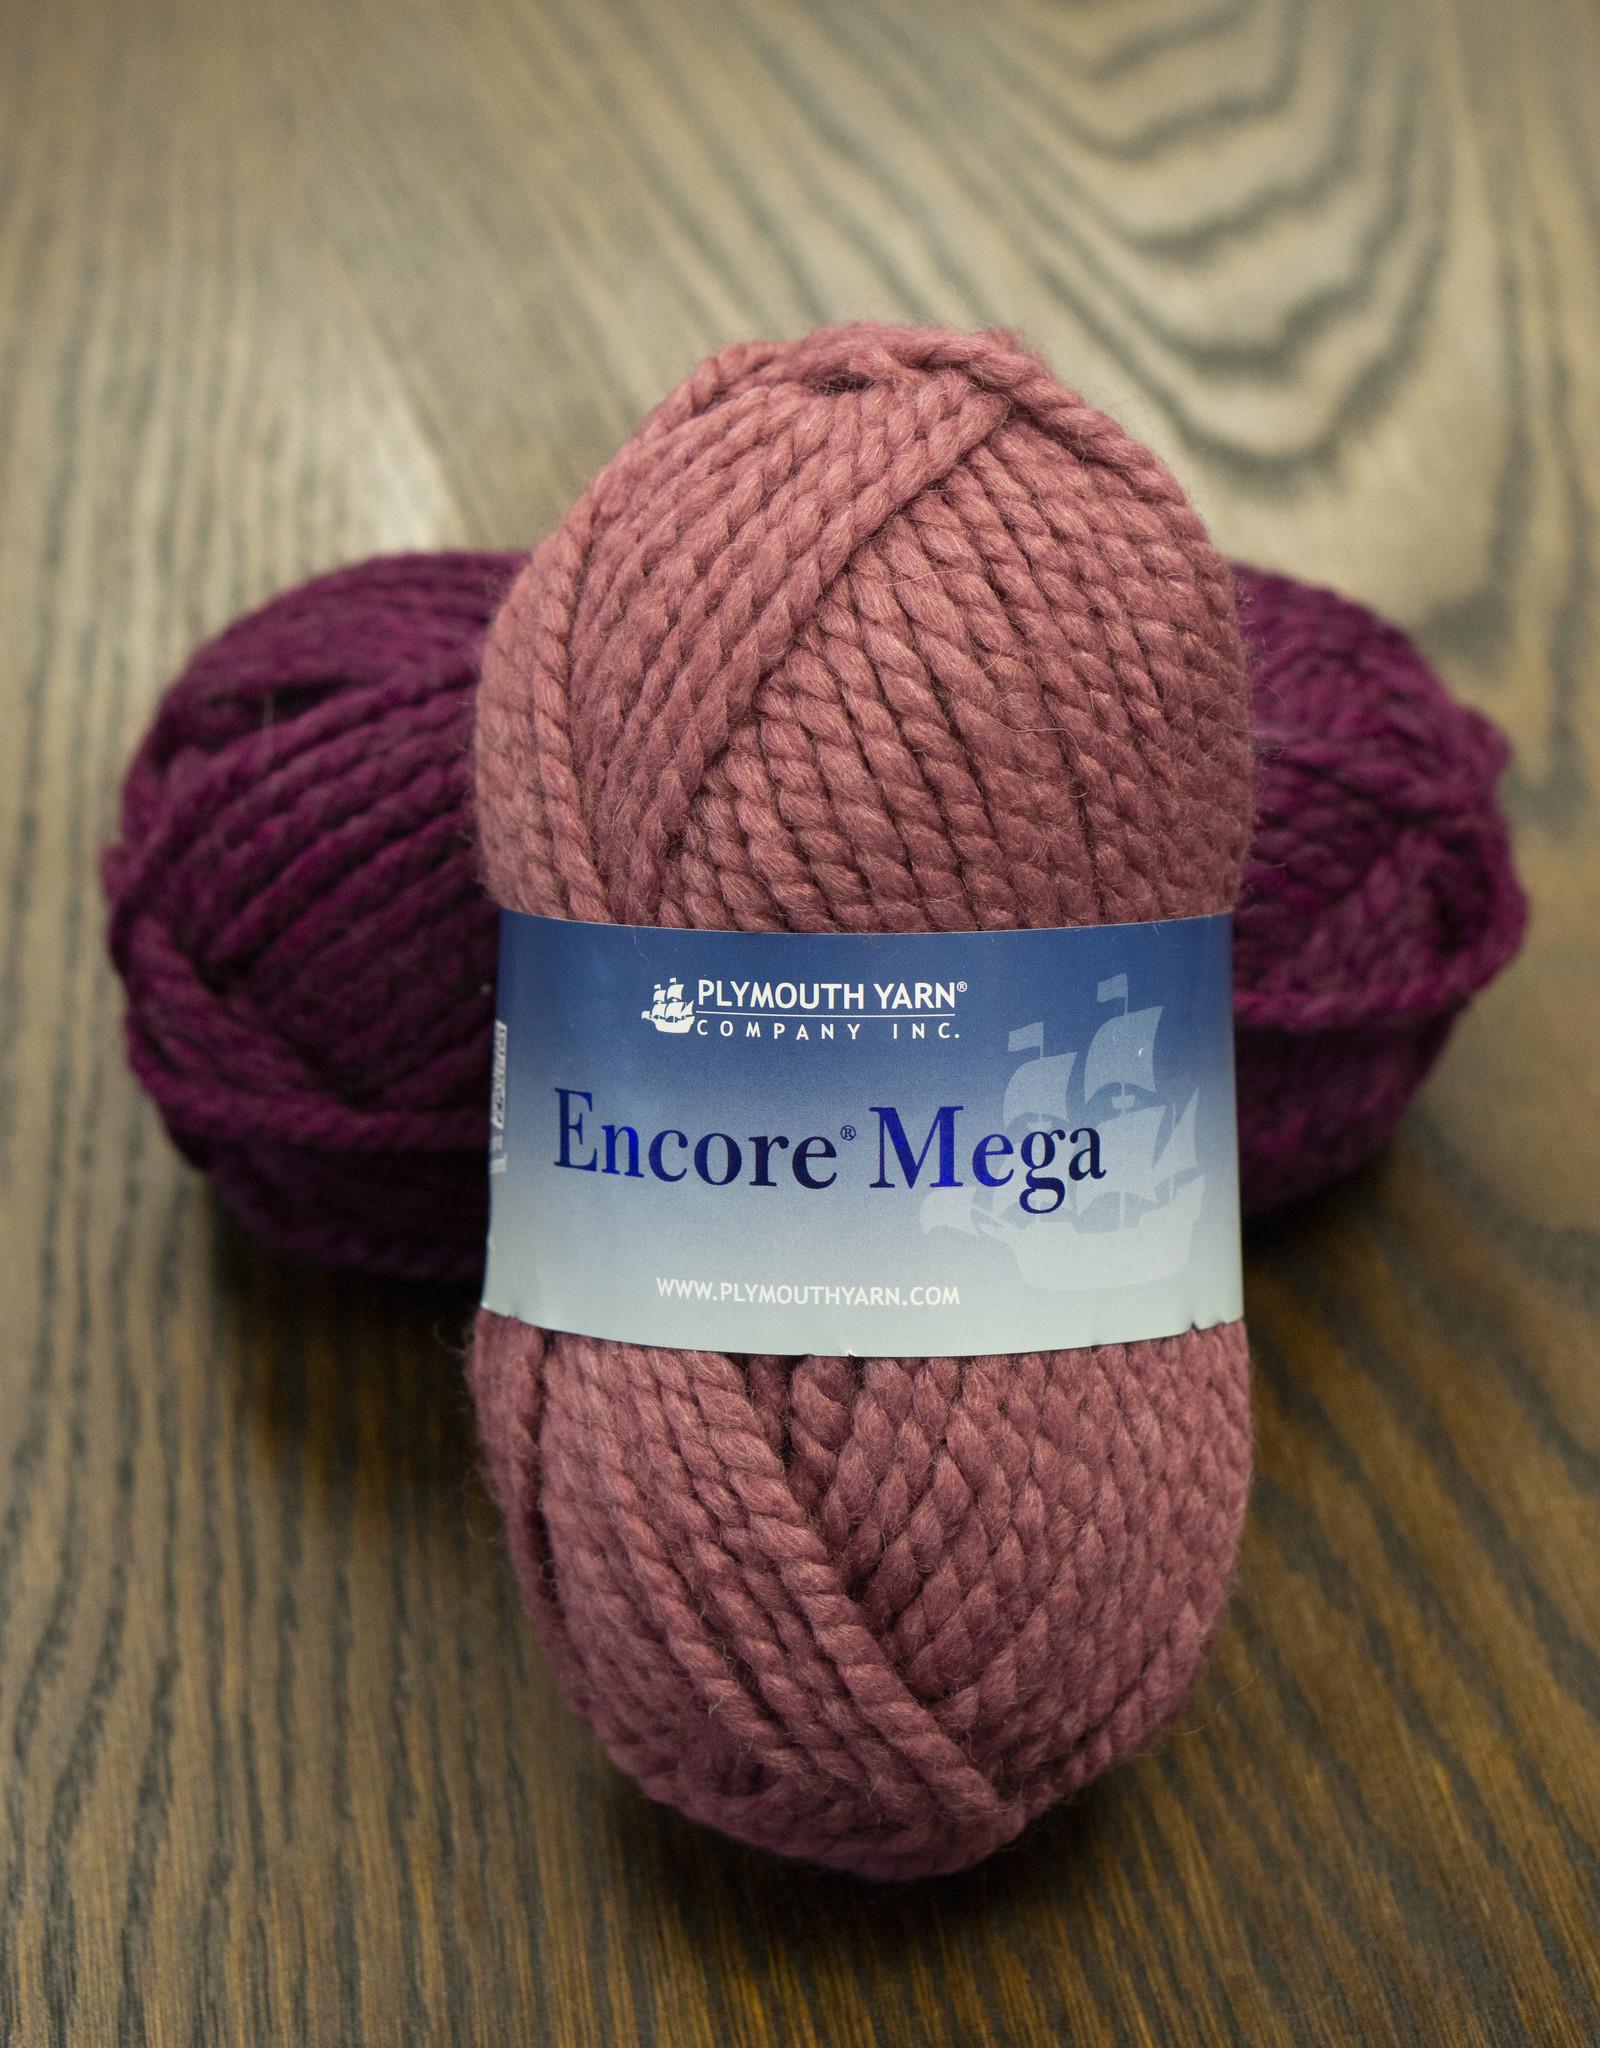 Plymouth Yarn Encore Mega